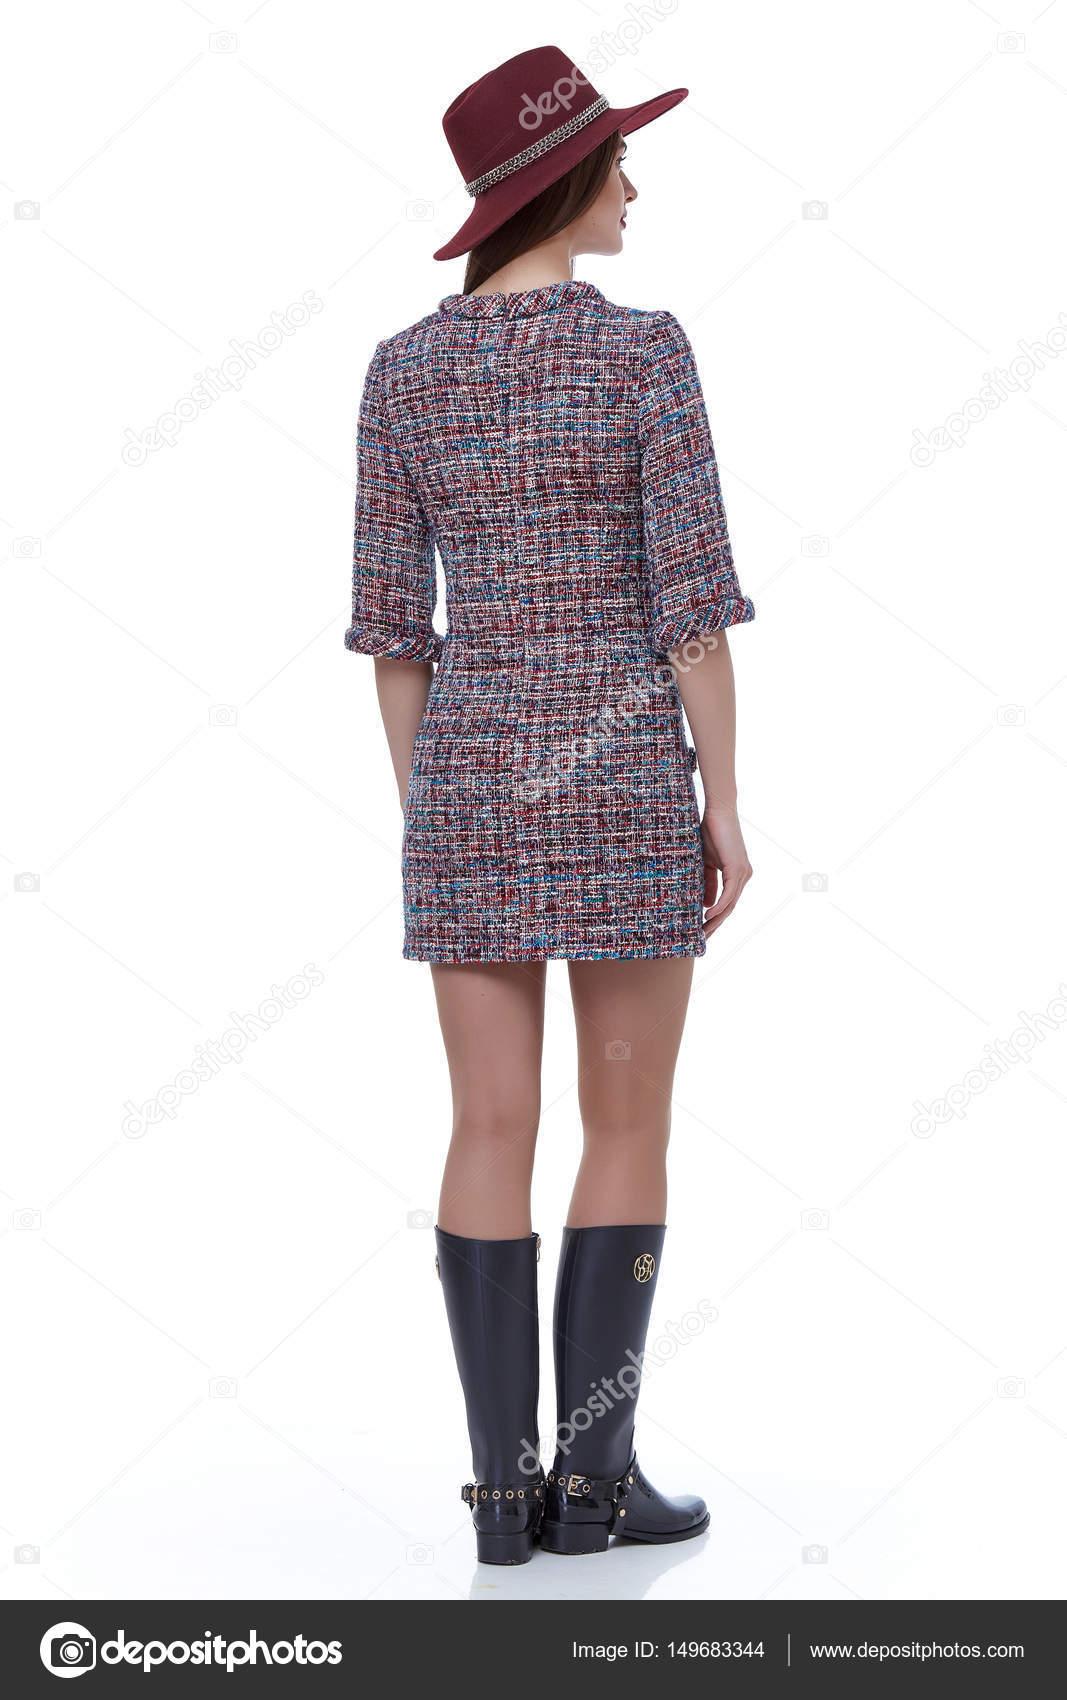 Design Kinderkleding.Schoonheid Vrouw Model Slijtage Stijlvol Design Trend Kinderkleding